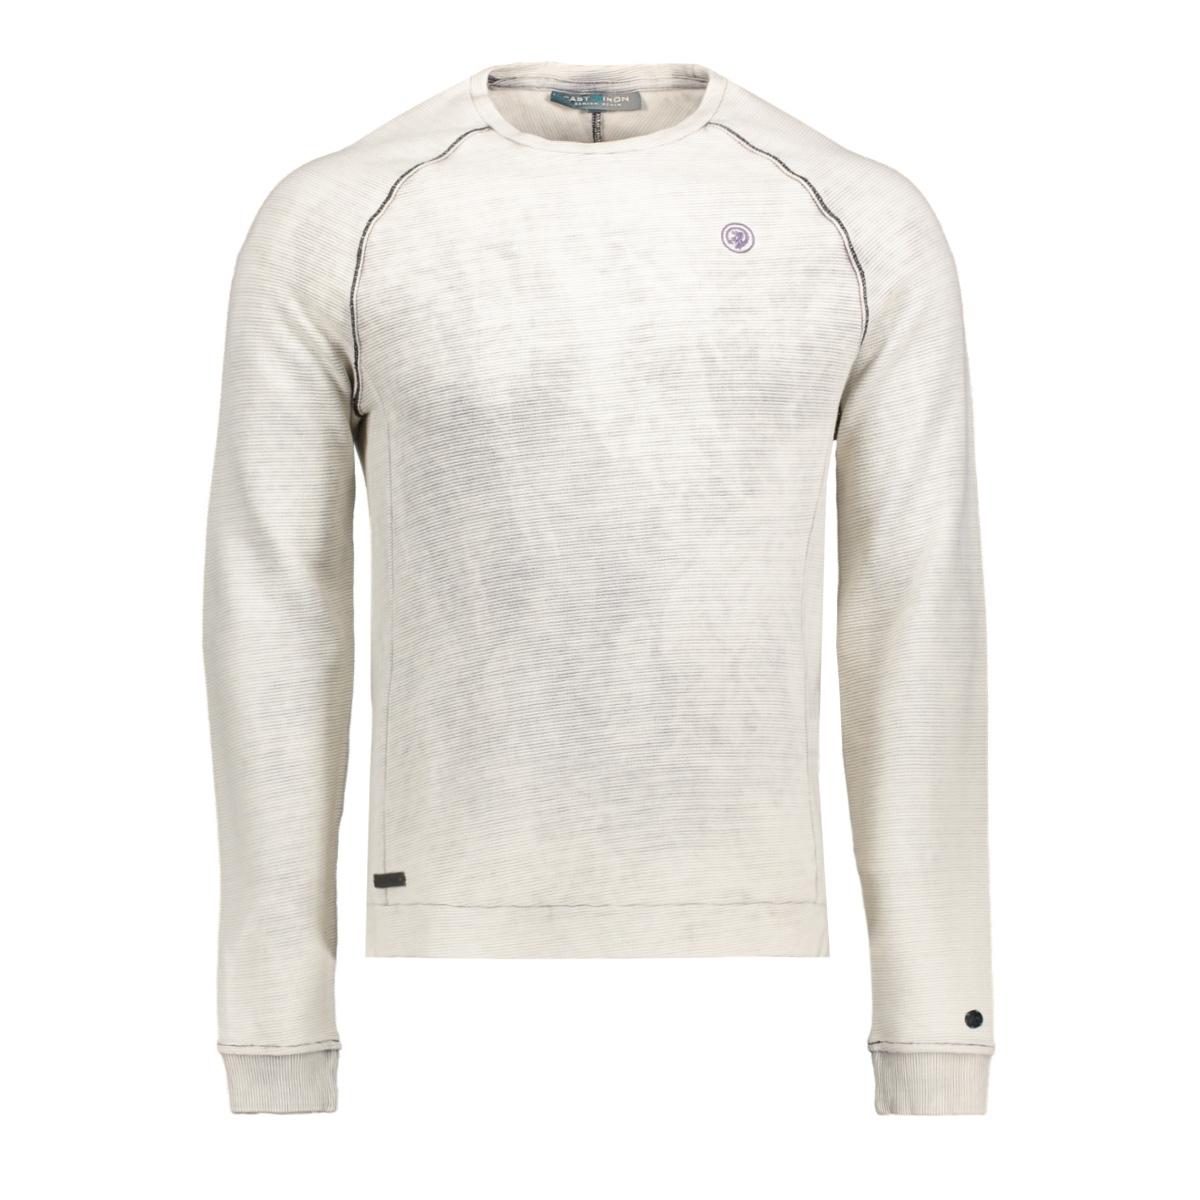 cts175306 cast iron sweater 920